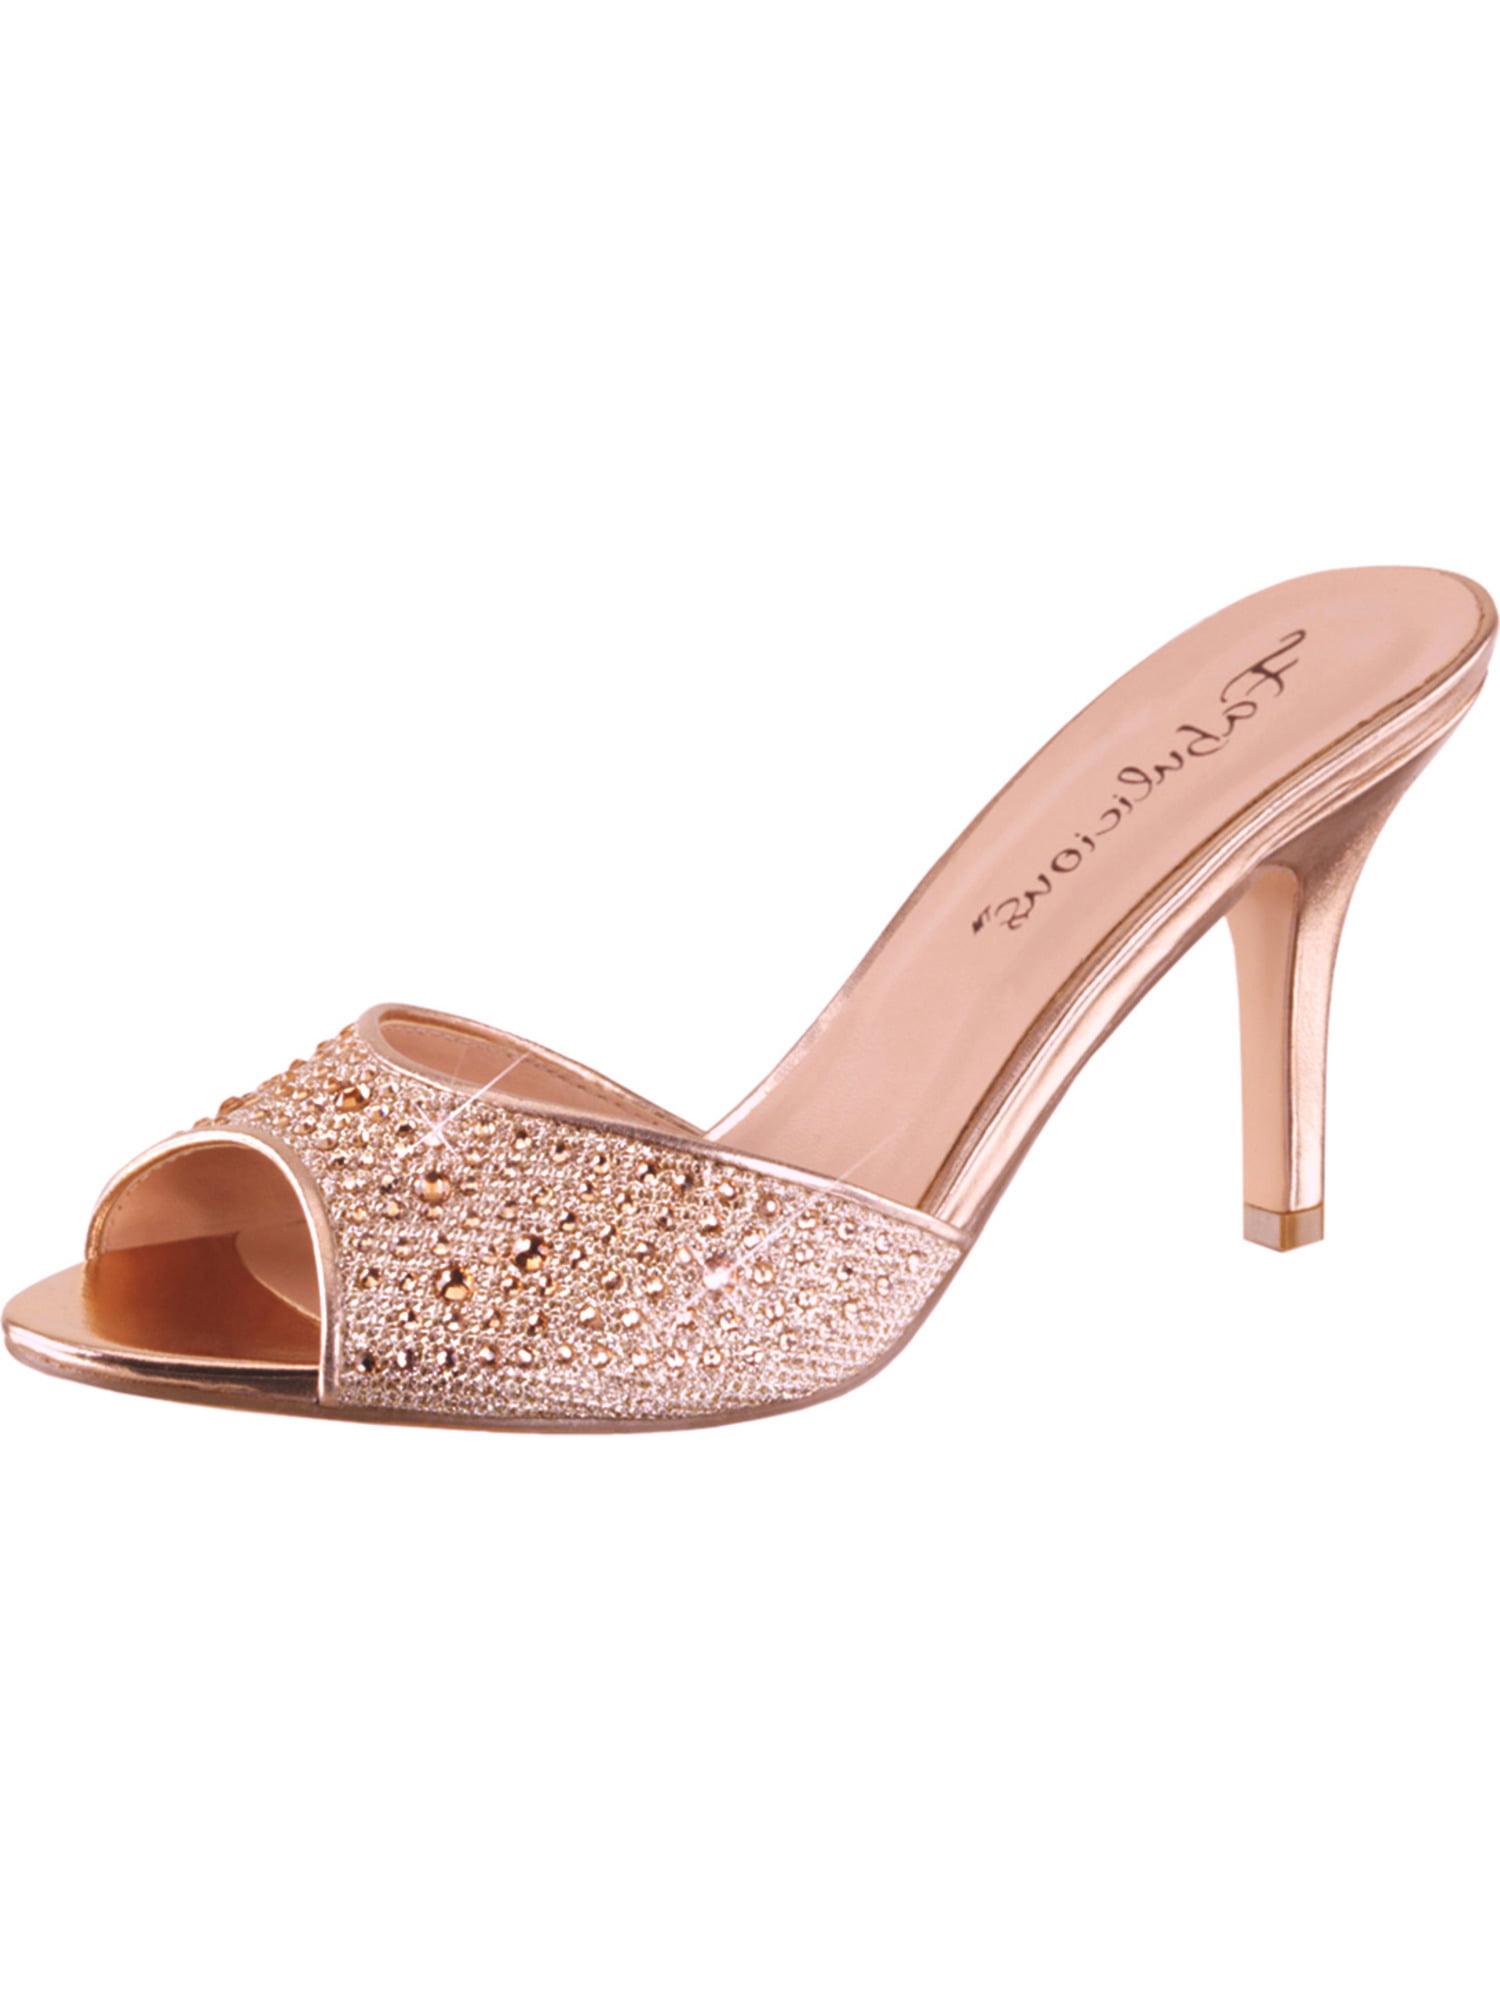 Womens Gold Dress Sandals Slides Shoes